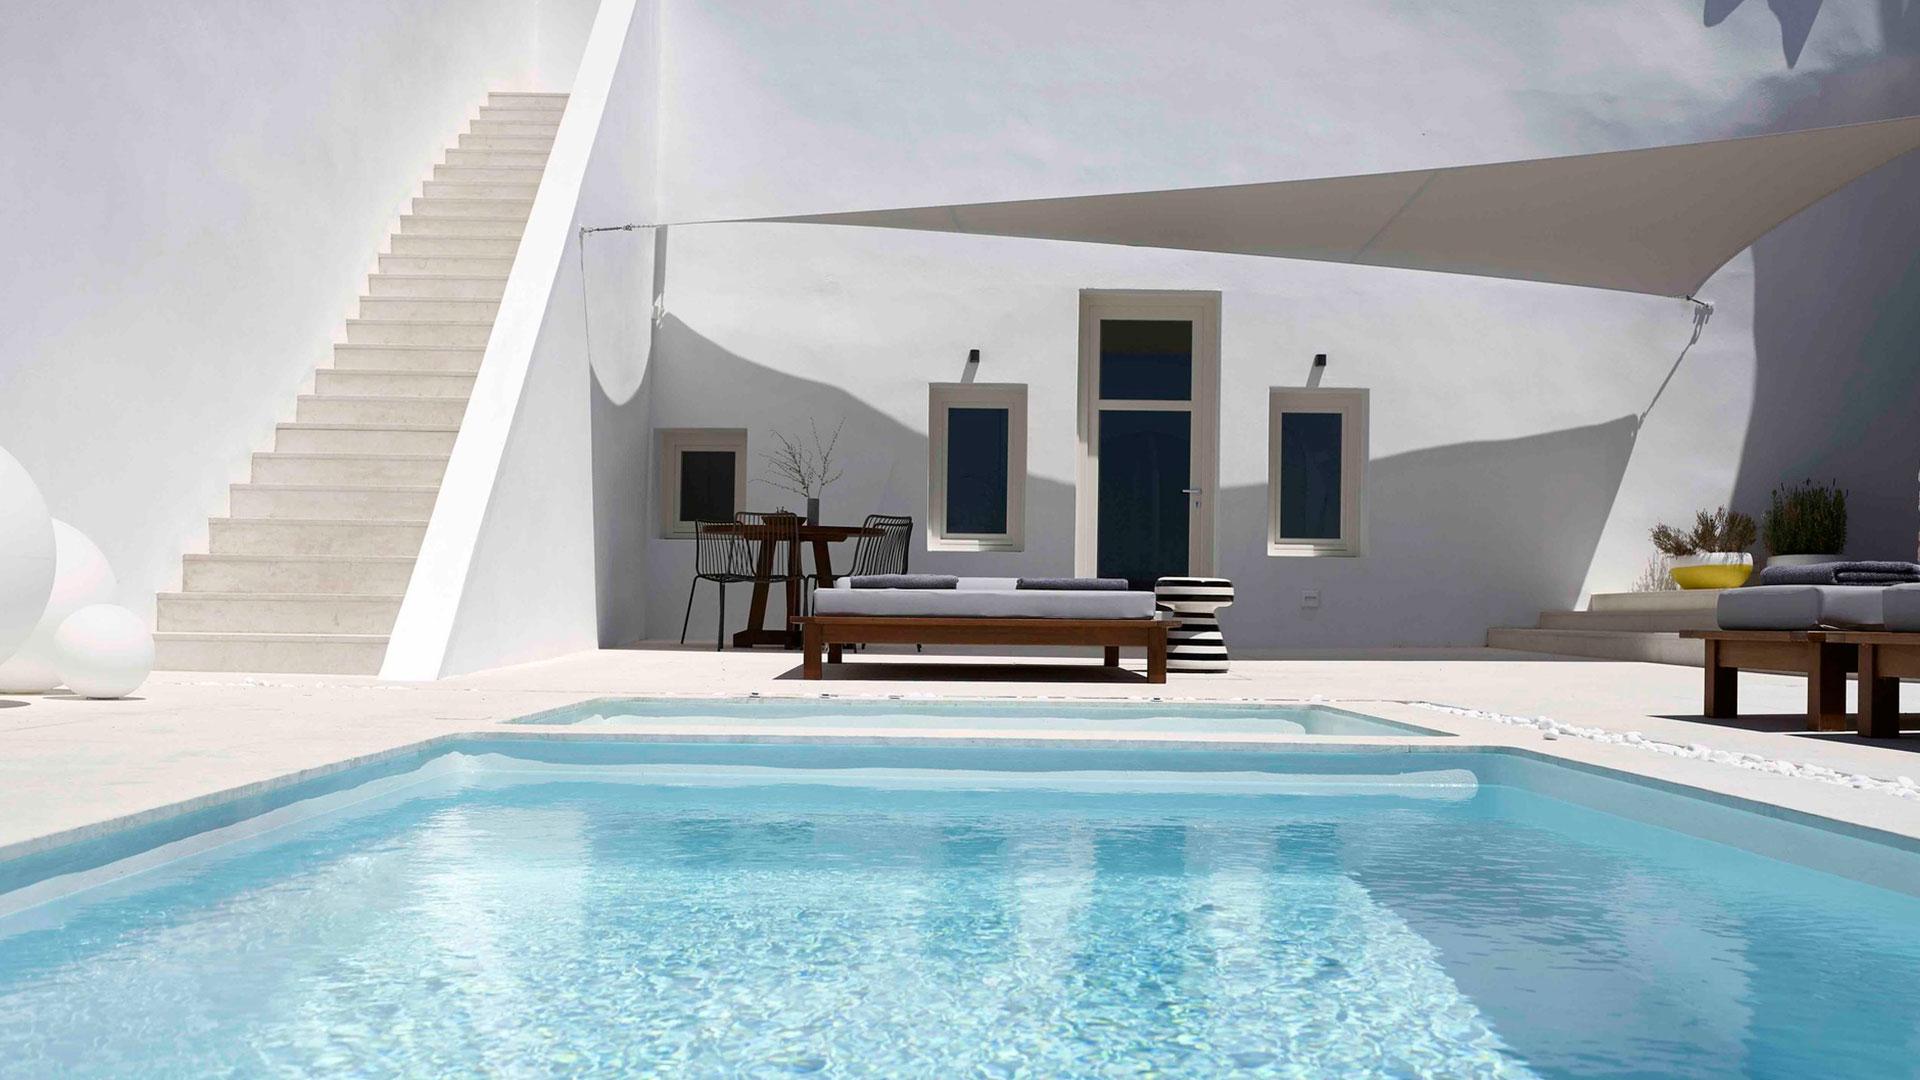 arquitectura mediterránea hero asset